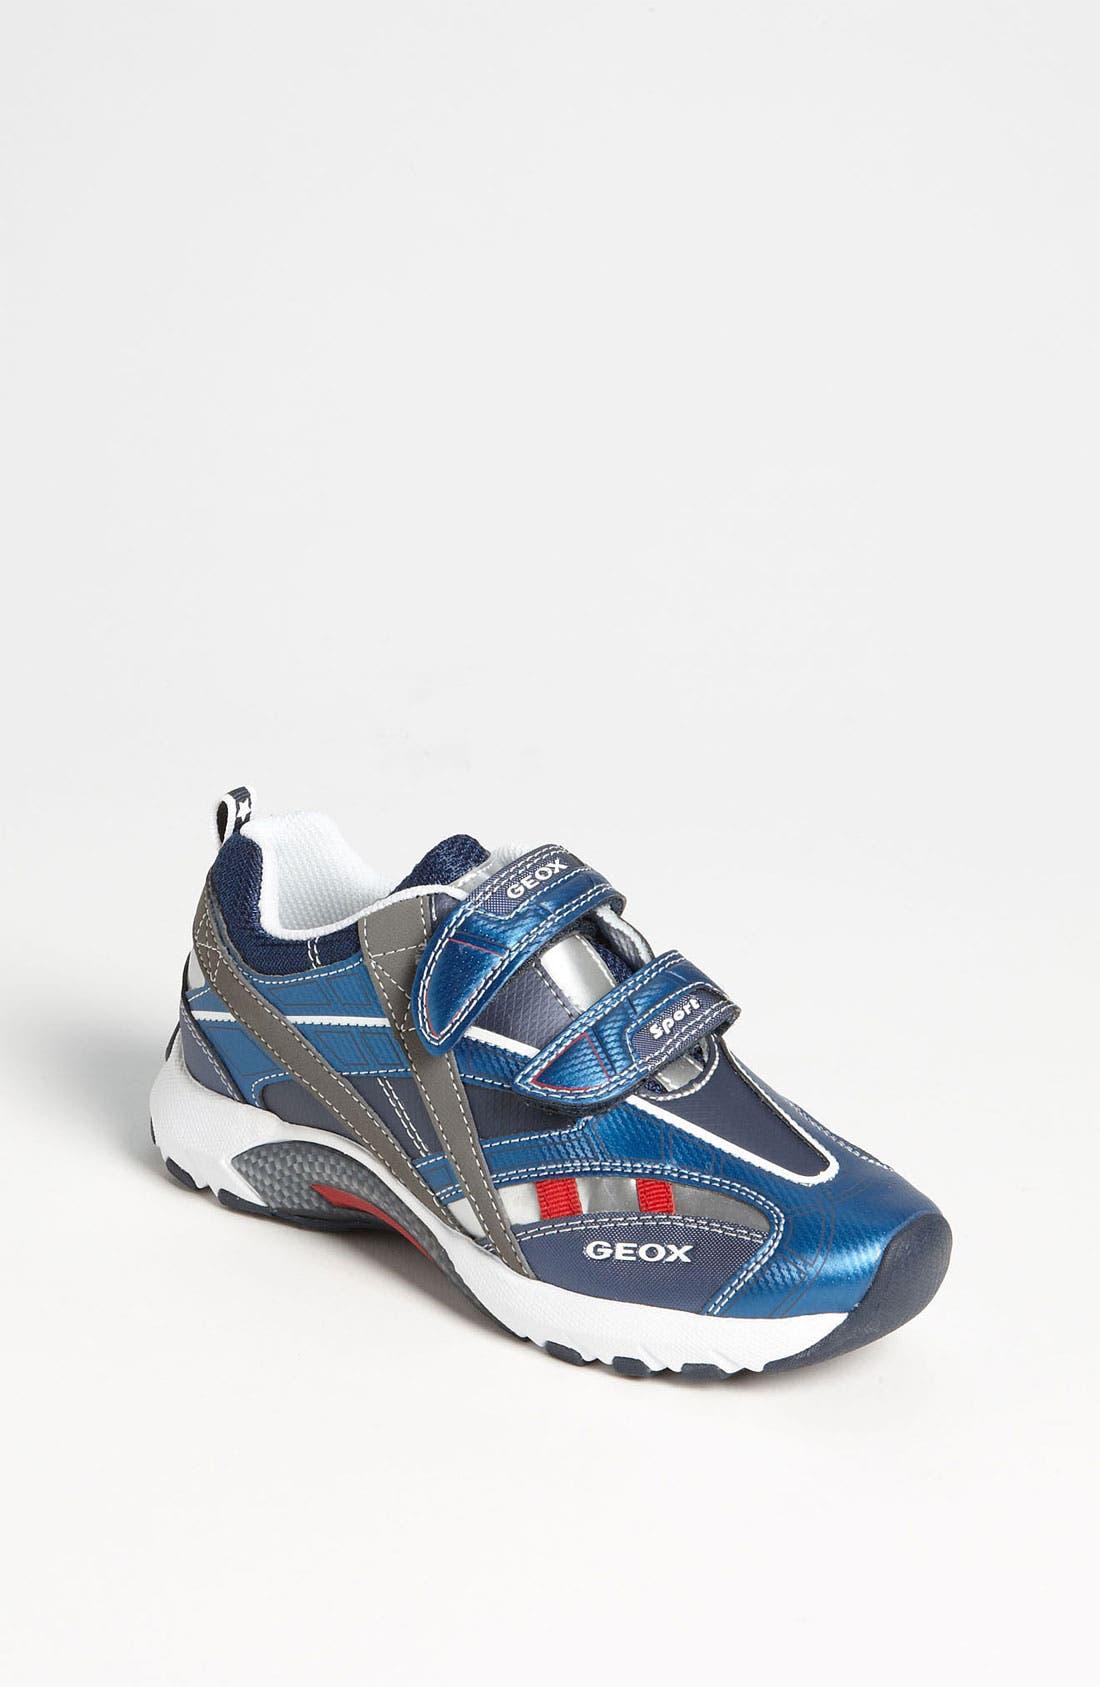 Main Image - Geox 'Stark' Sneaker (Toddler, Little Kid & Big Kid)